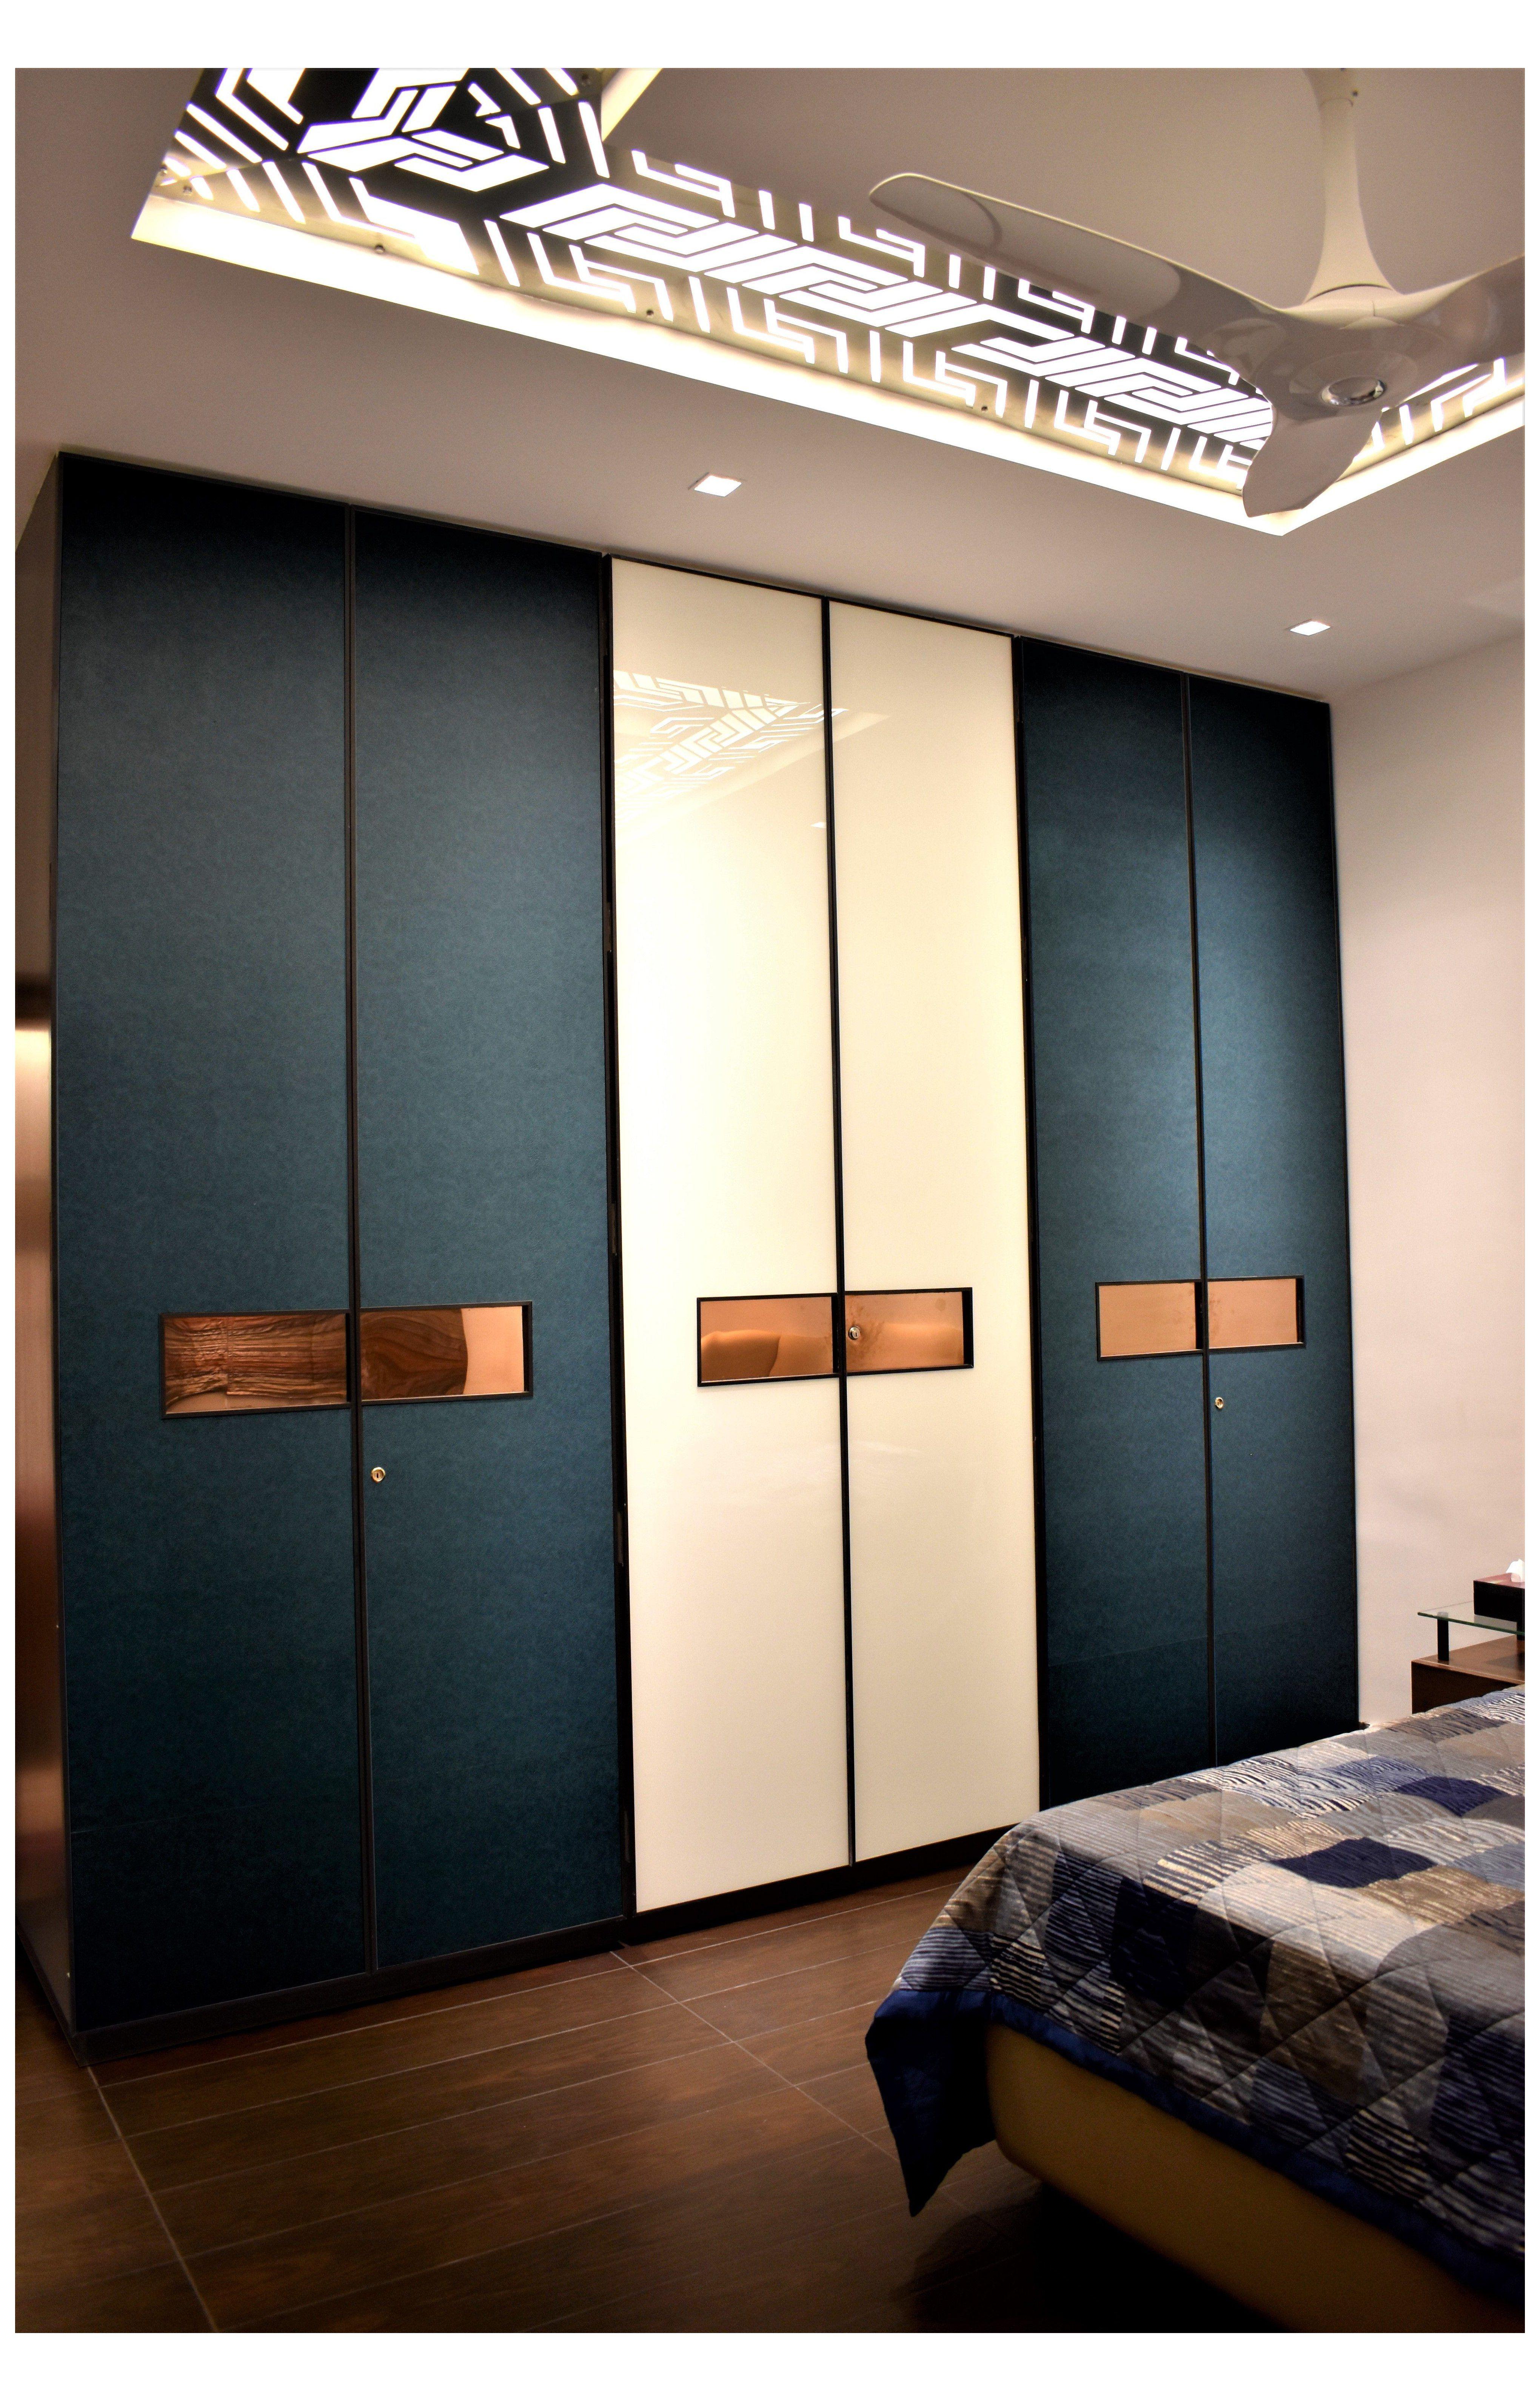 Master Bedroom Wardrobe Door Designs Laminate Wardrobedoordesignslaminate In 2021 Master Bedroom Wardrobe Designs Wardrobe Door Designs Bedroom Closet Design Bedroom wardrobe design 2021